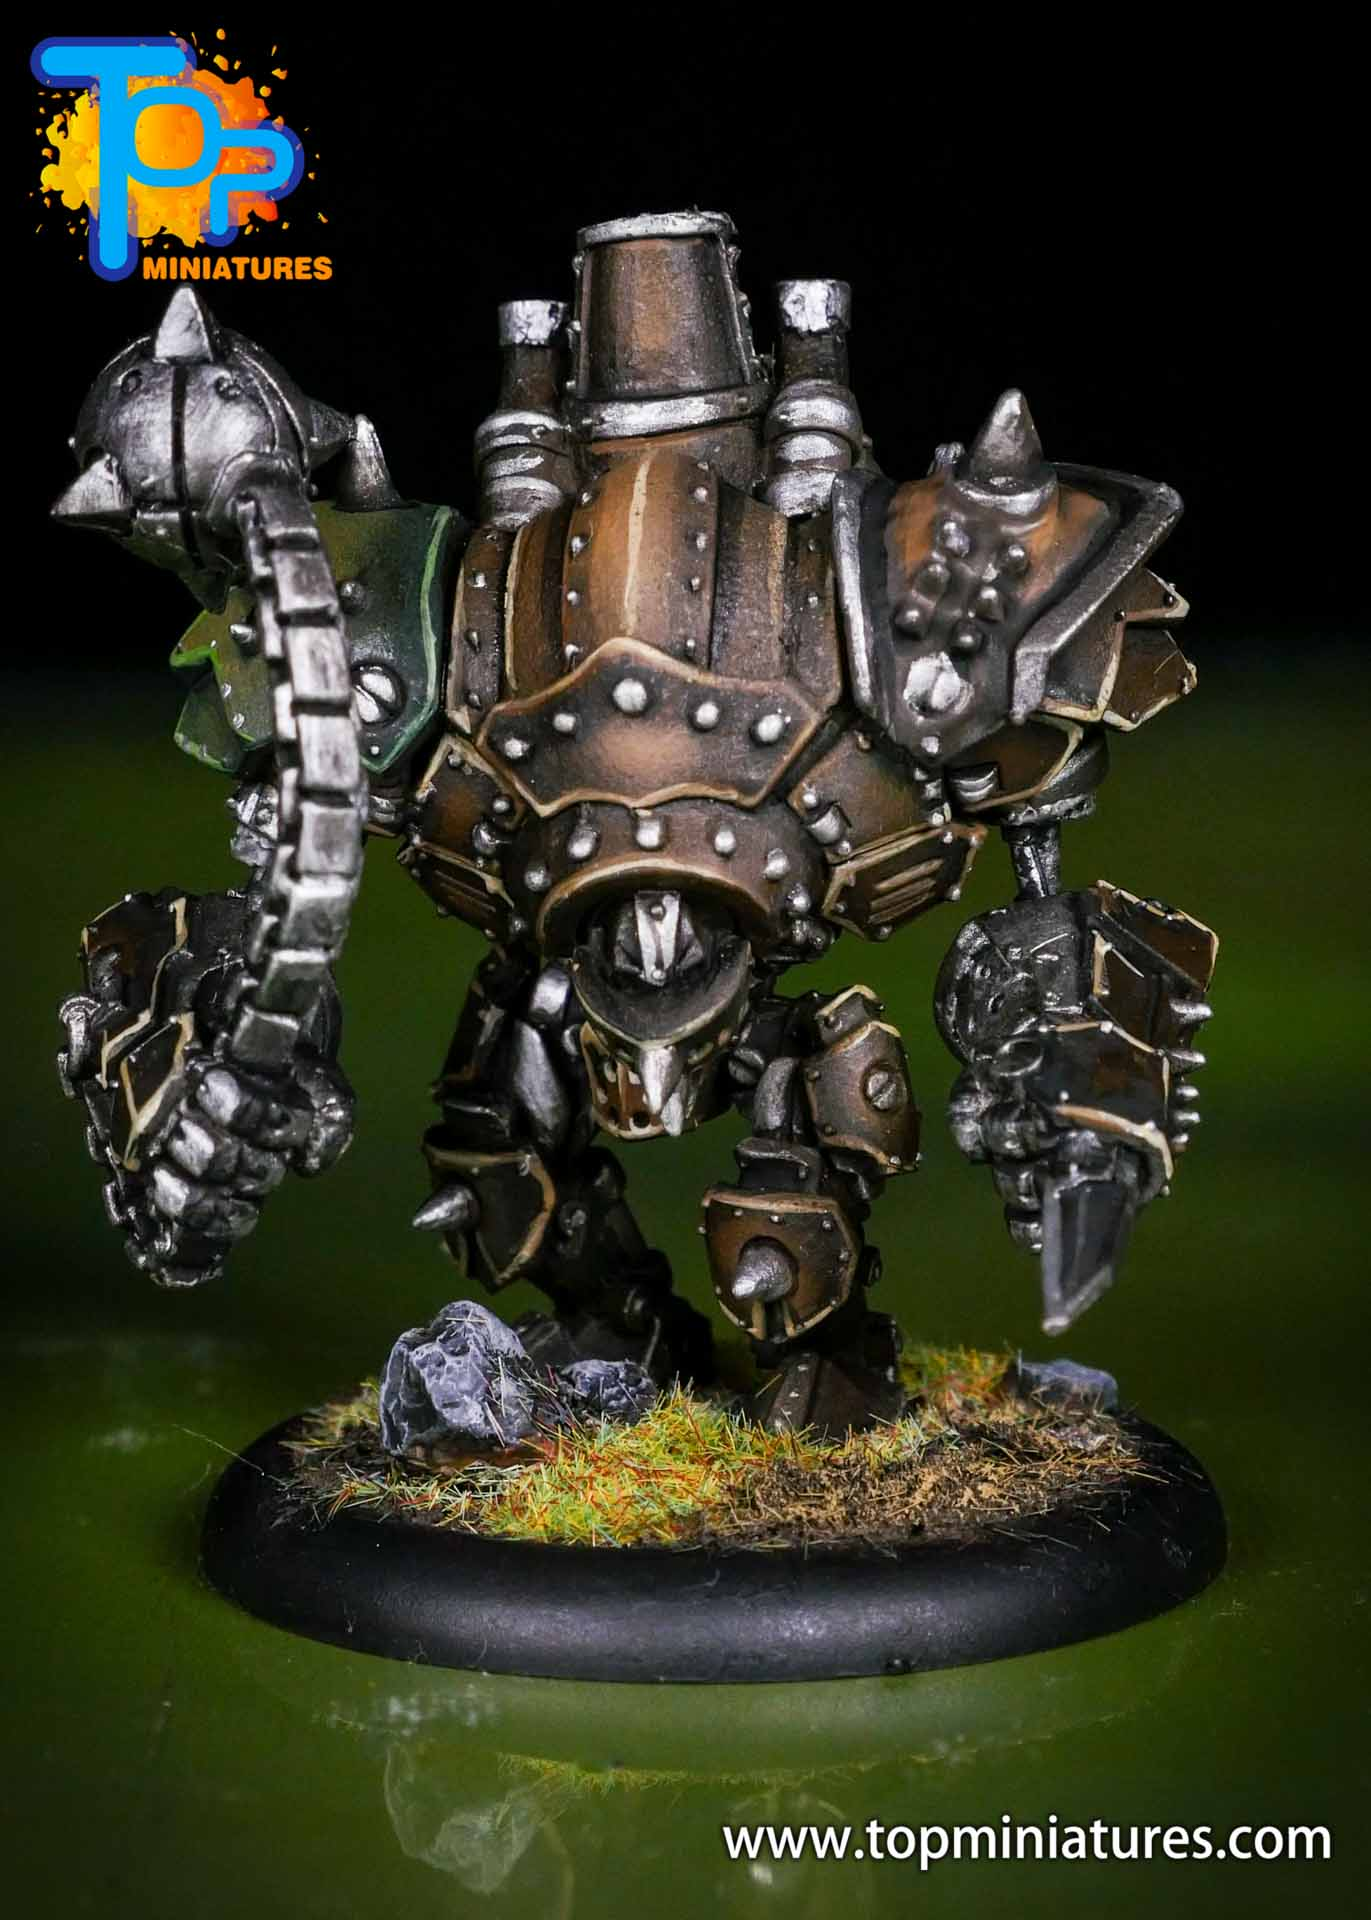 Warmachine Mercenaries Cygnar Mangler Warjack (1)